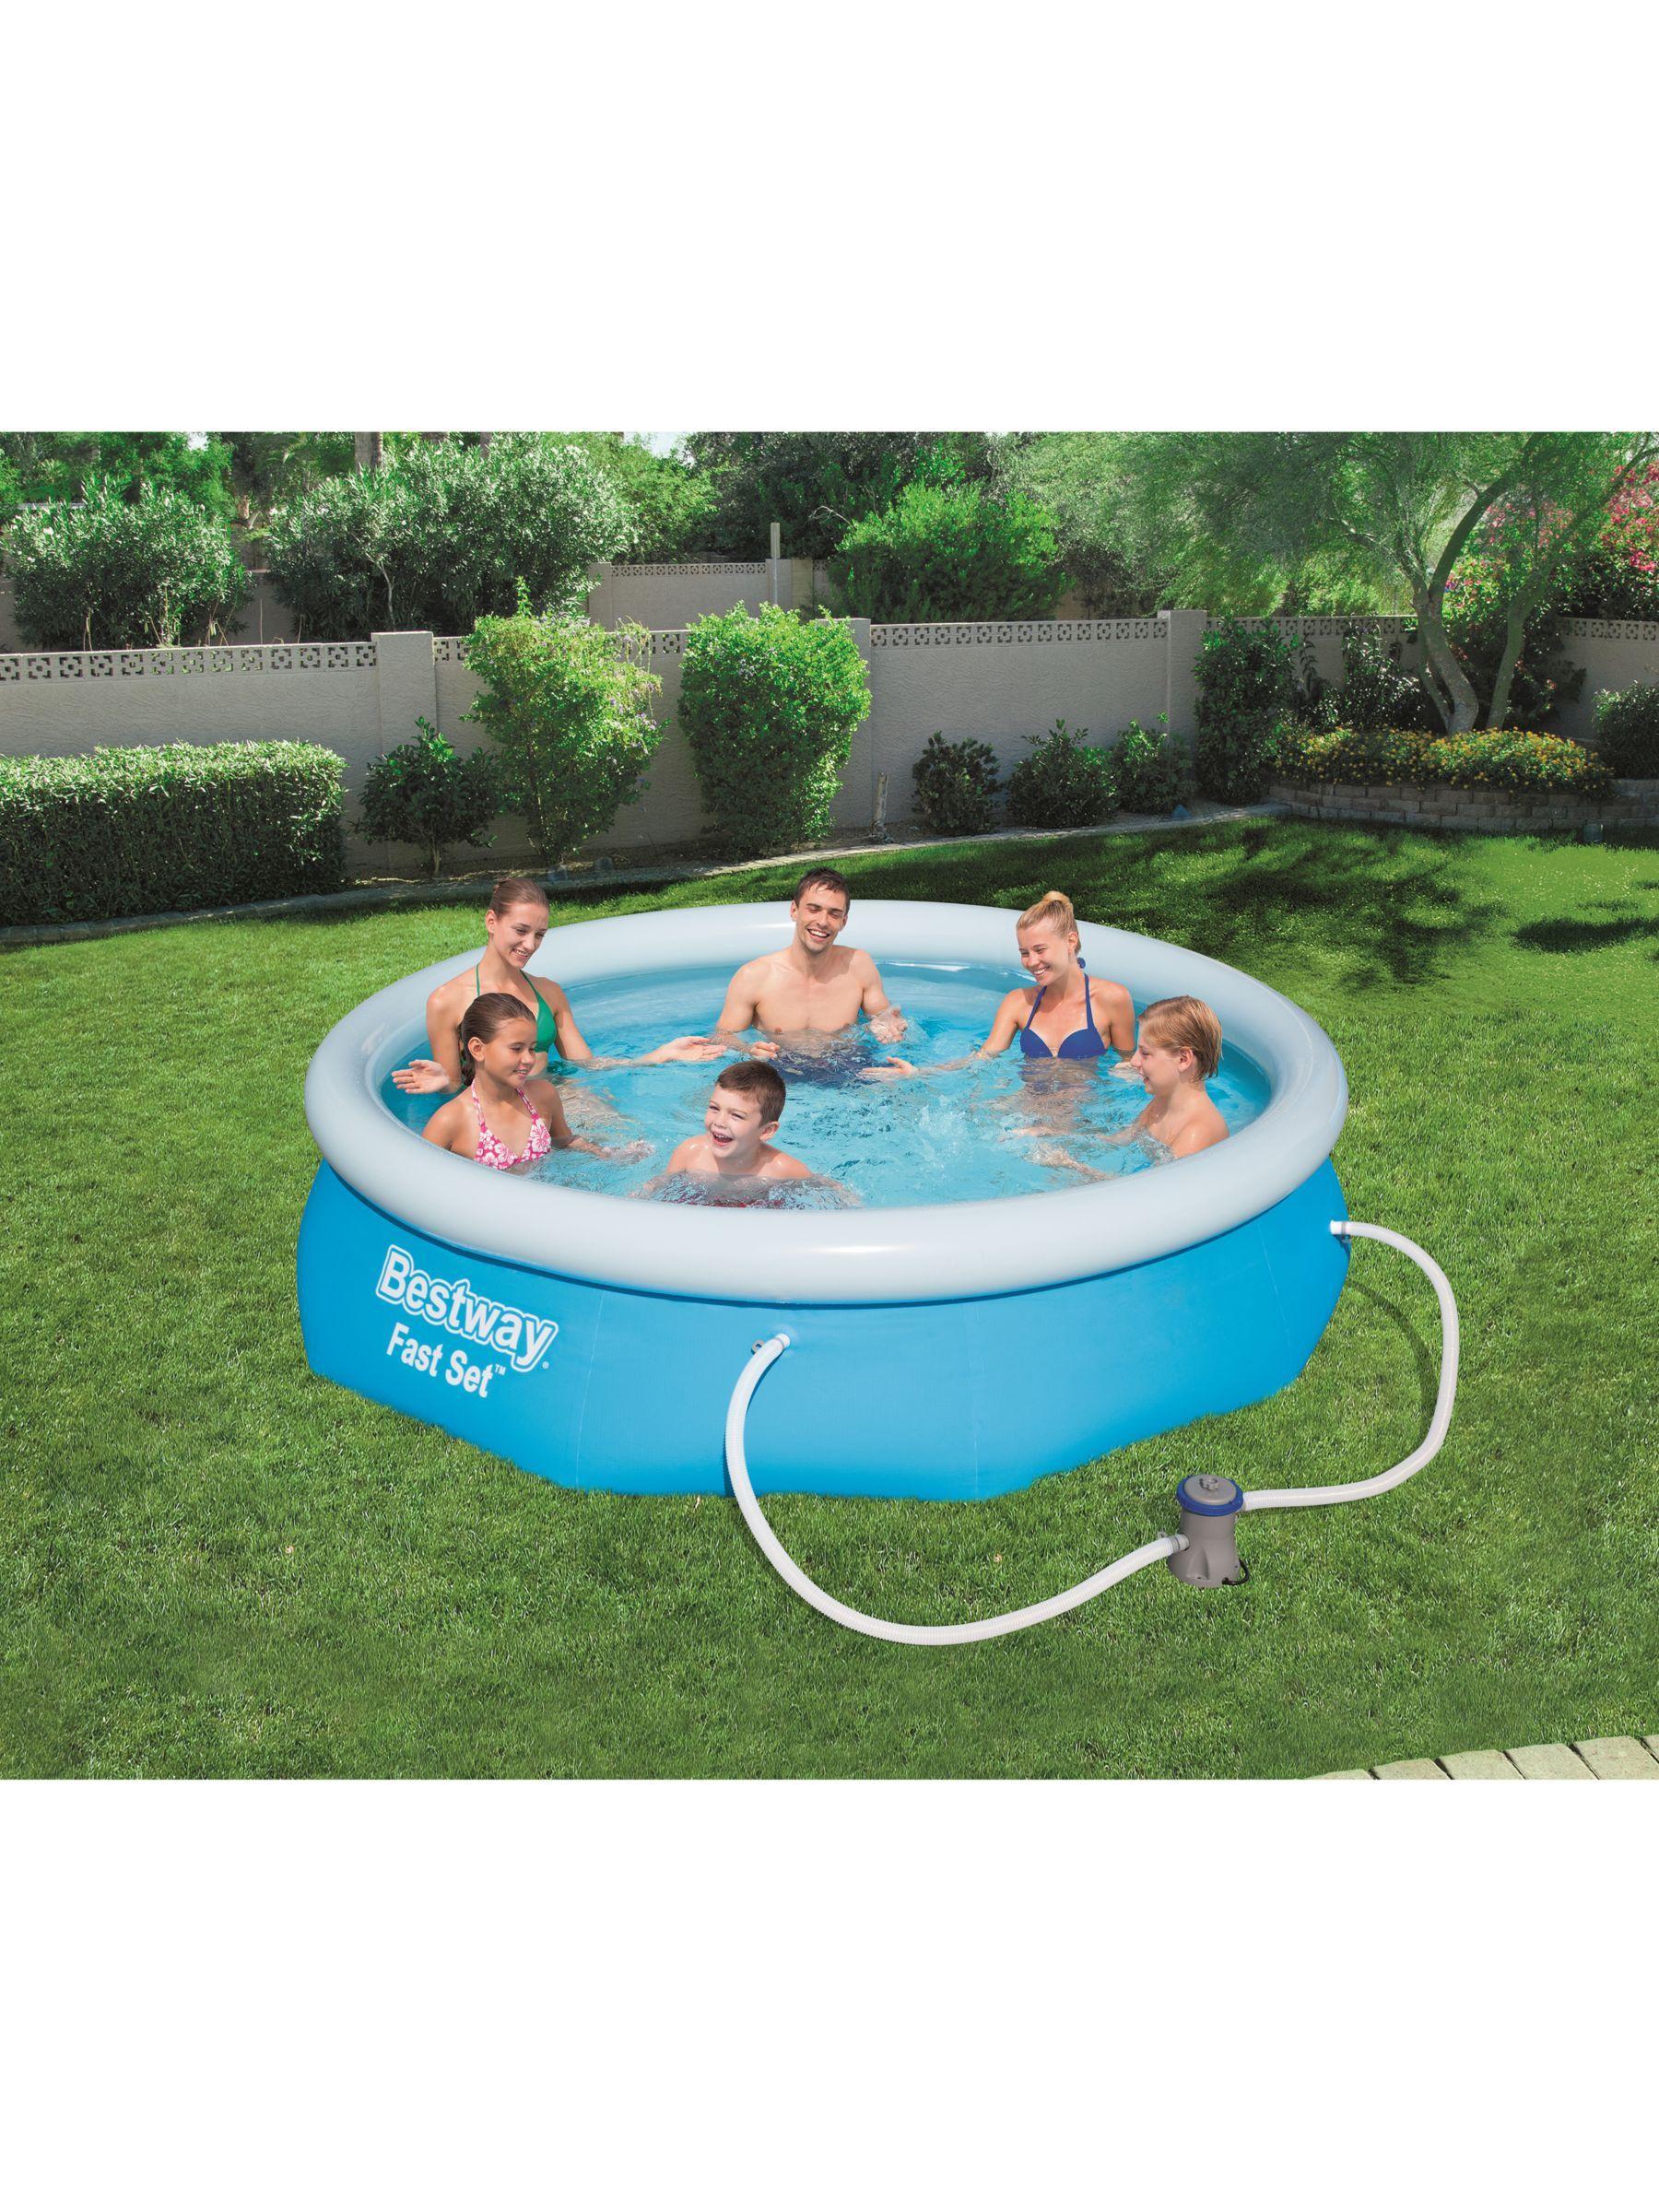 Bestway Fast Set Pool, 10 X 30 | 10Ft Pool, Easy Set Pools ... destiné Piscine Tubulaire Castorama